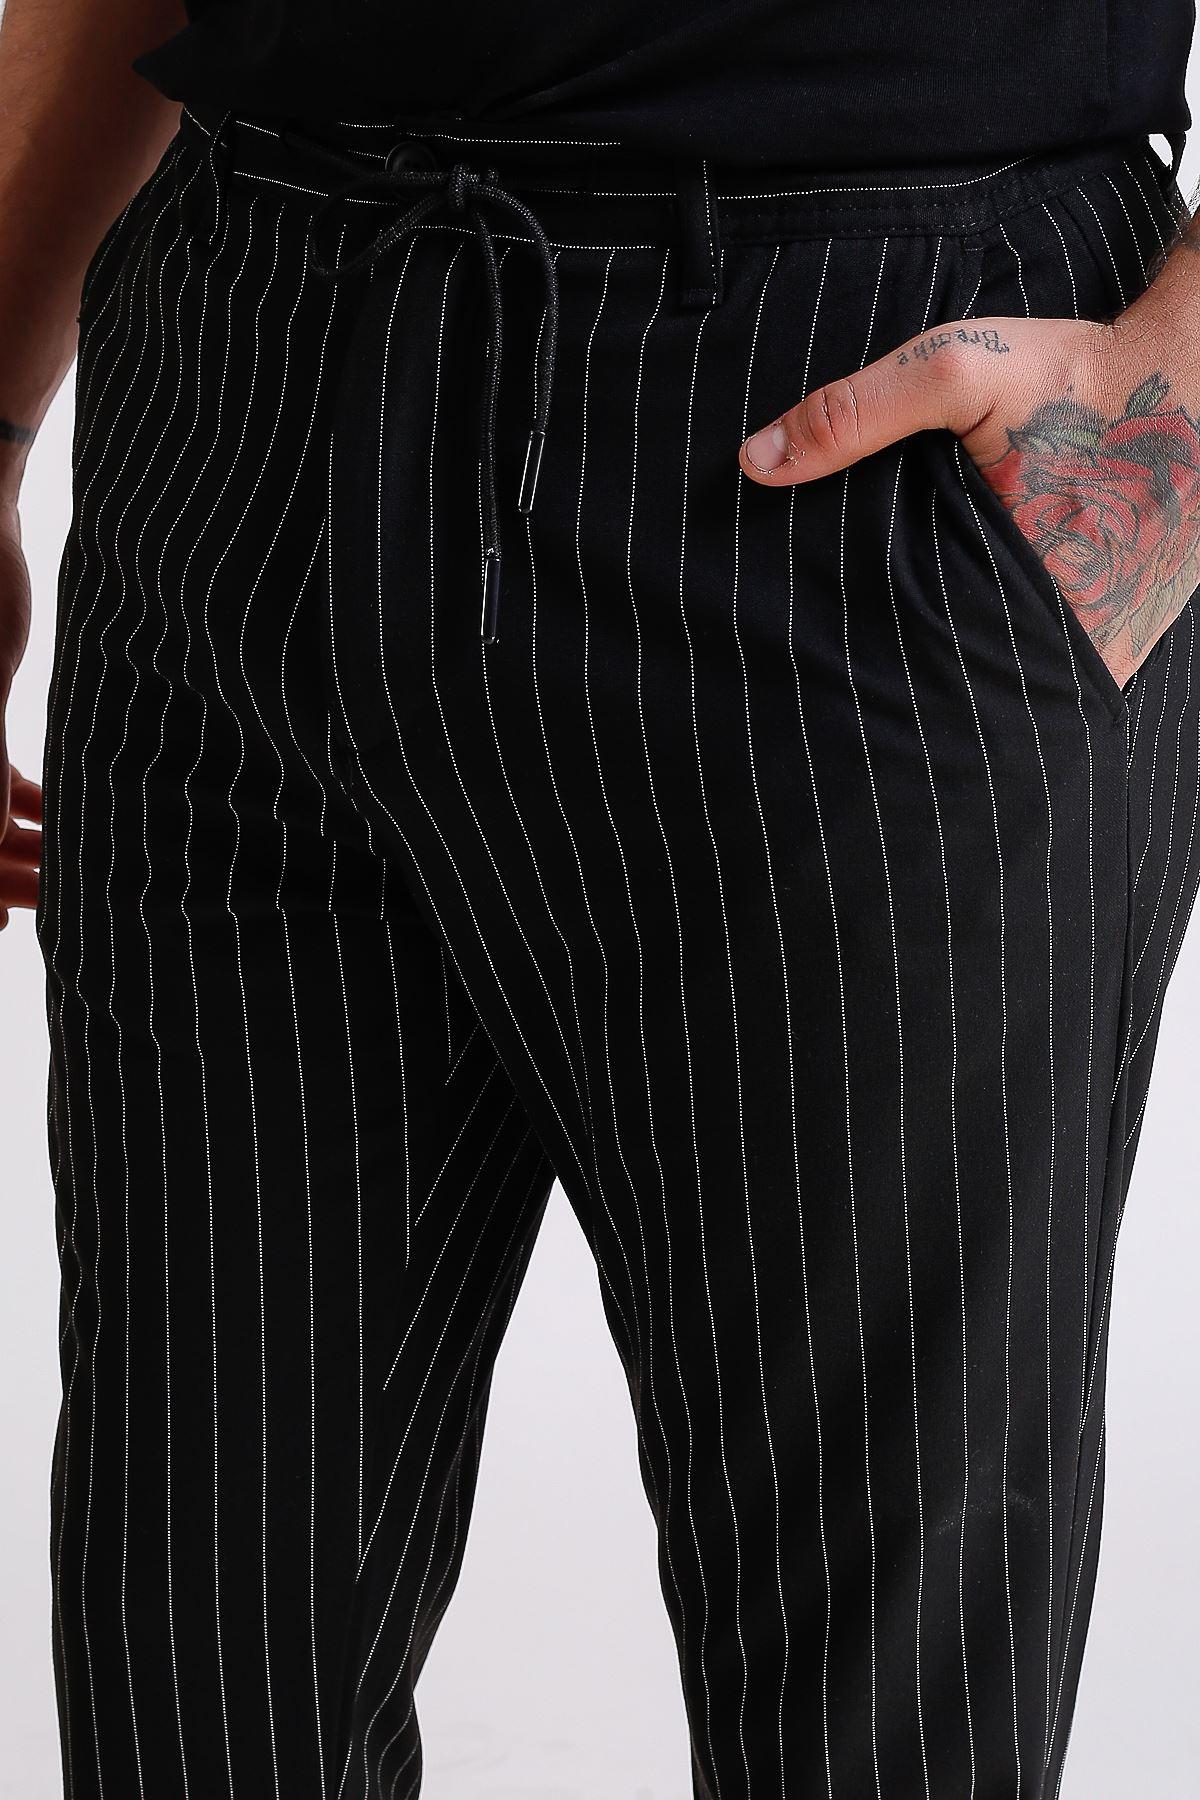 Erkek Beli Lastikli ve İpli Duble paçalı Çizgili Siyah Jogger Pantolon